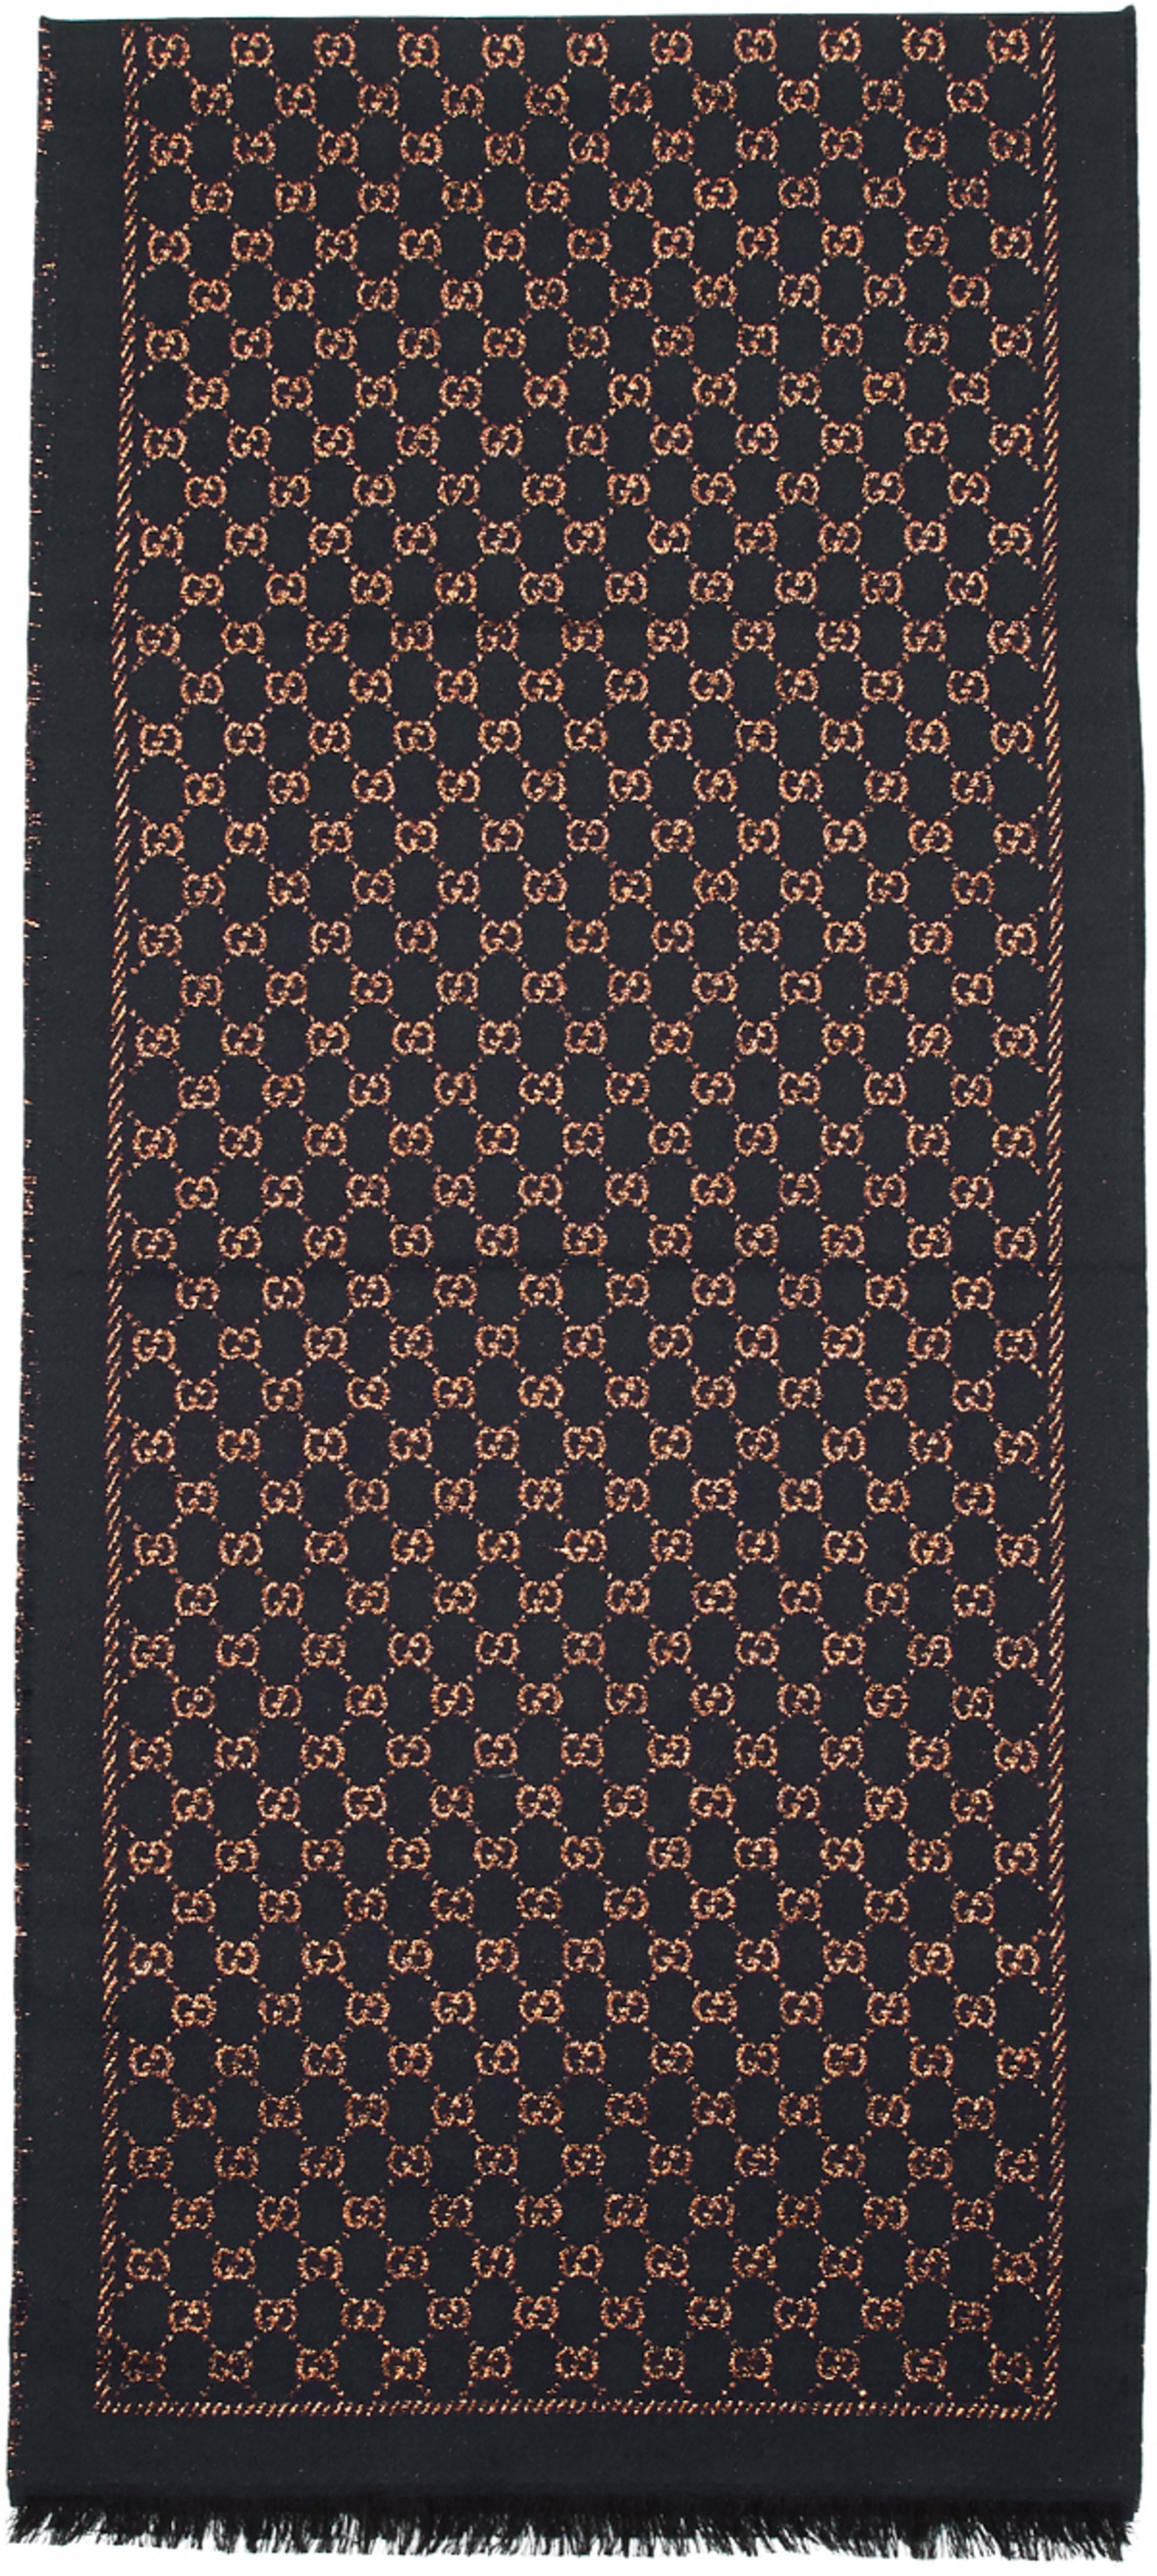 0ef09200b369 Designer scarves for Women